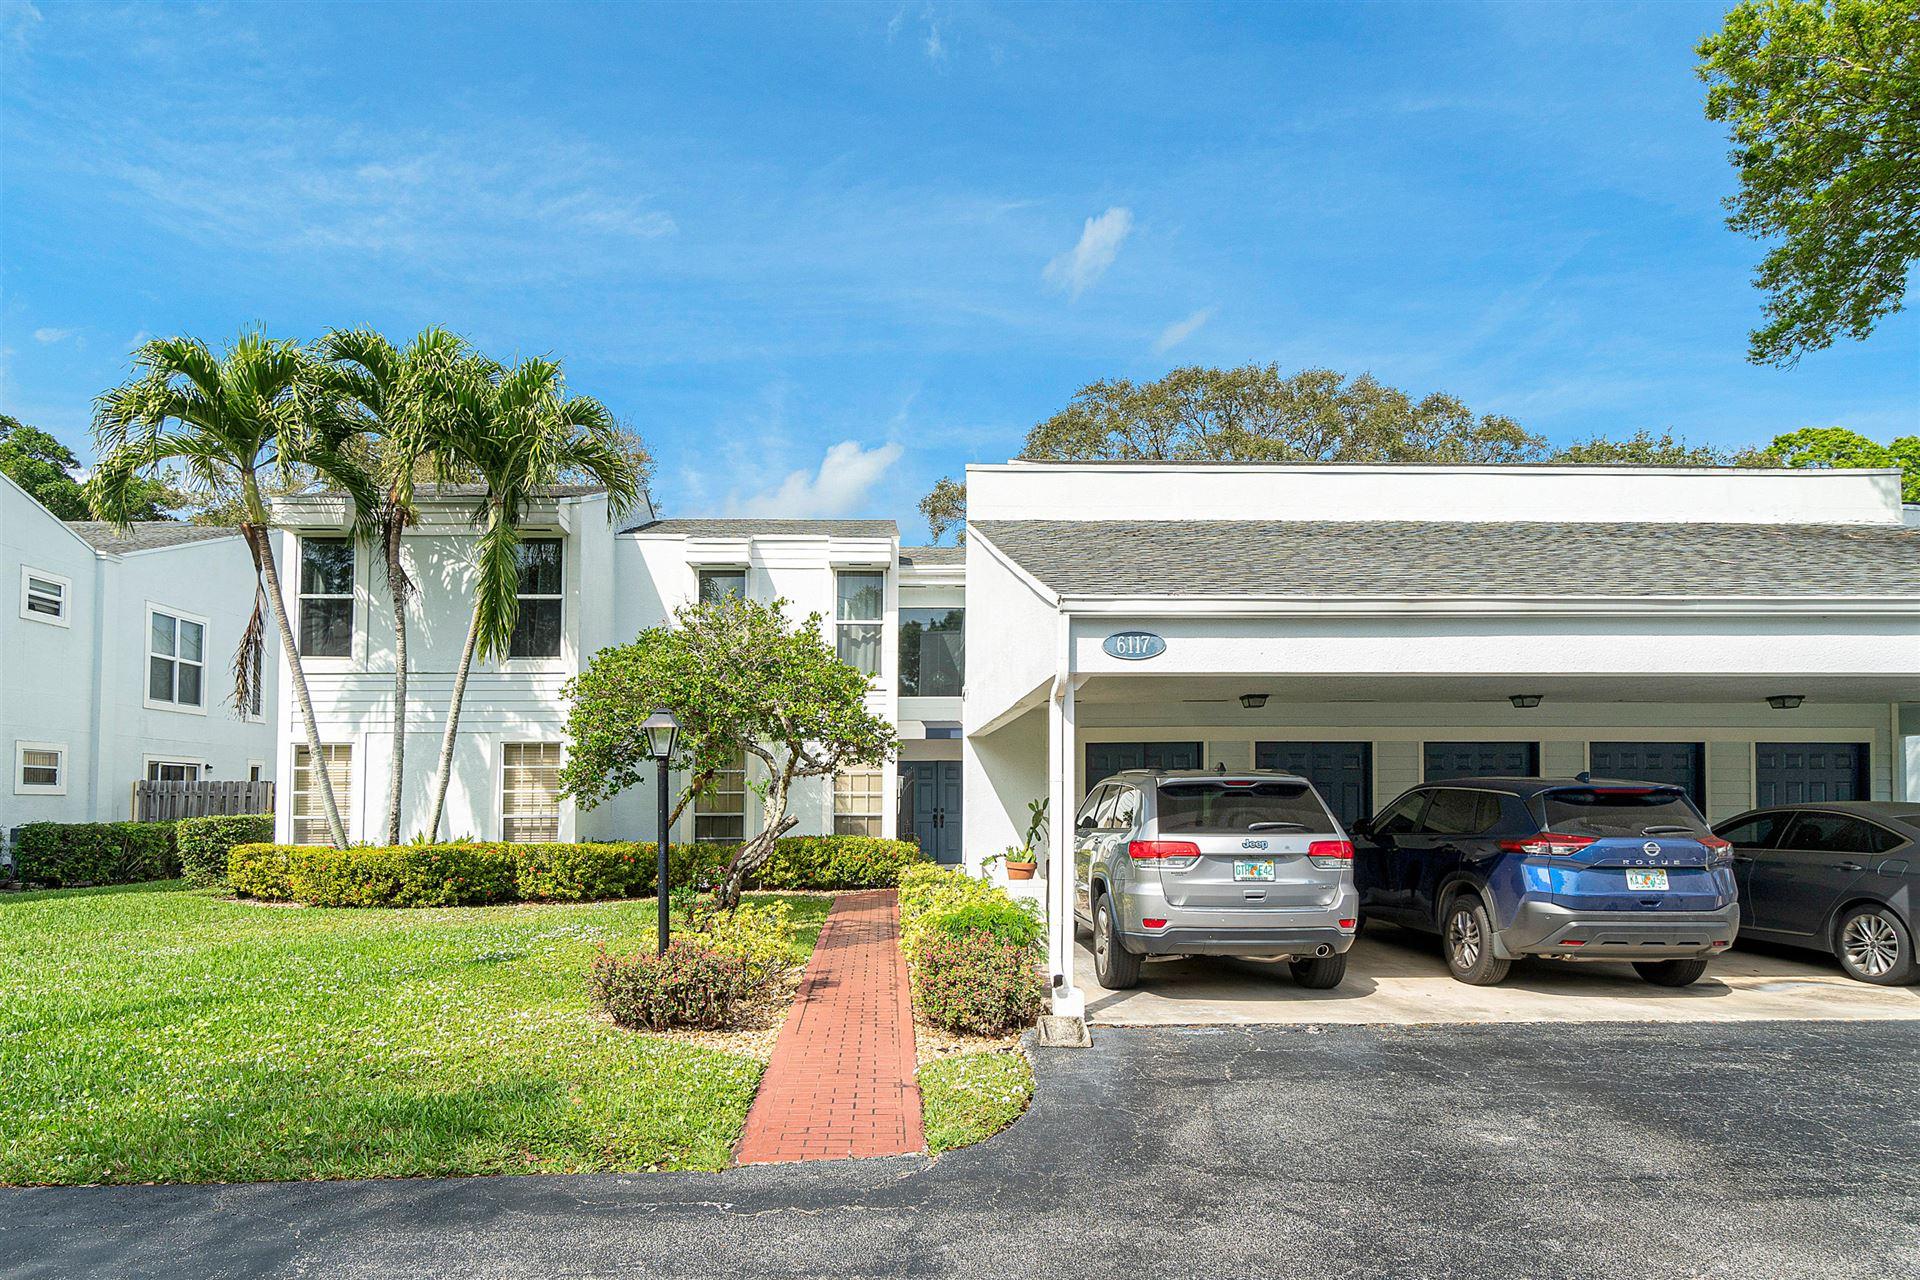 6117 Old Court Road #235, Boca Raton, FL 33433 - #: RX-10695930